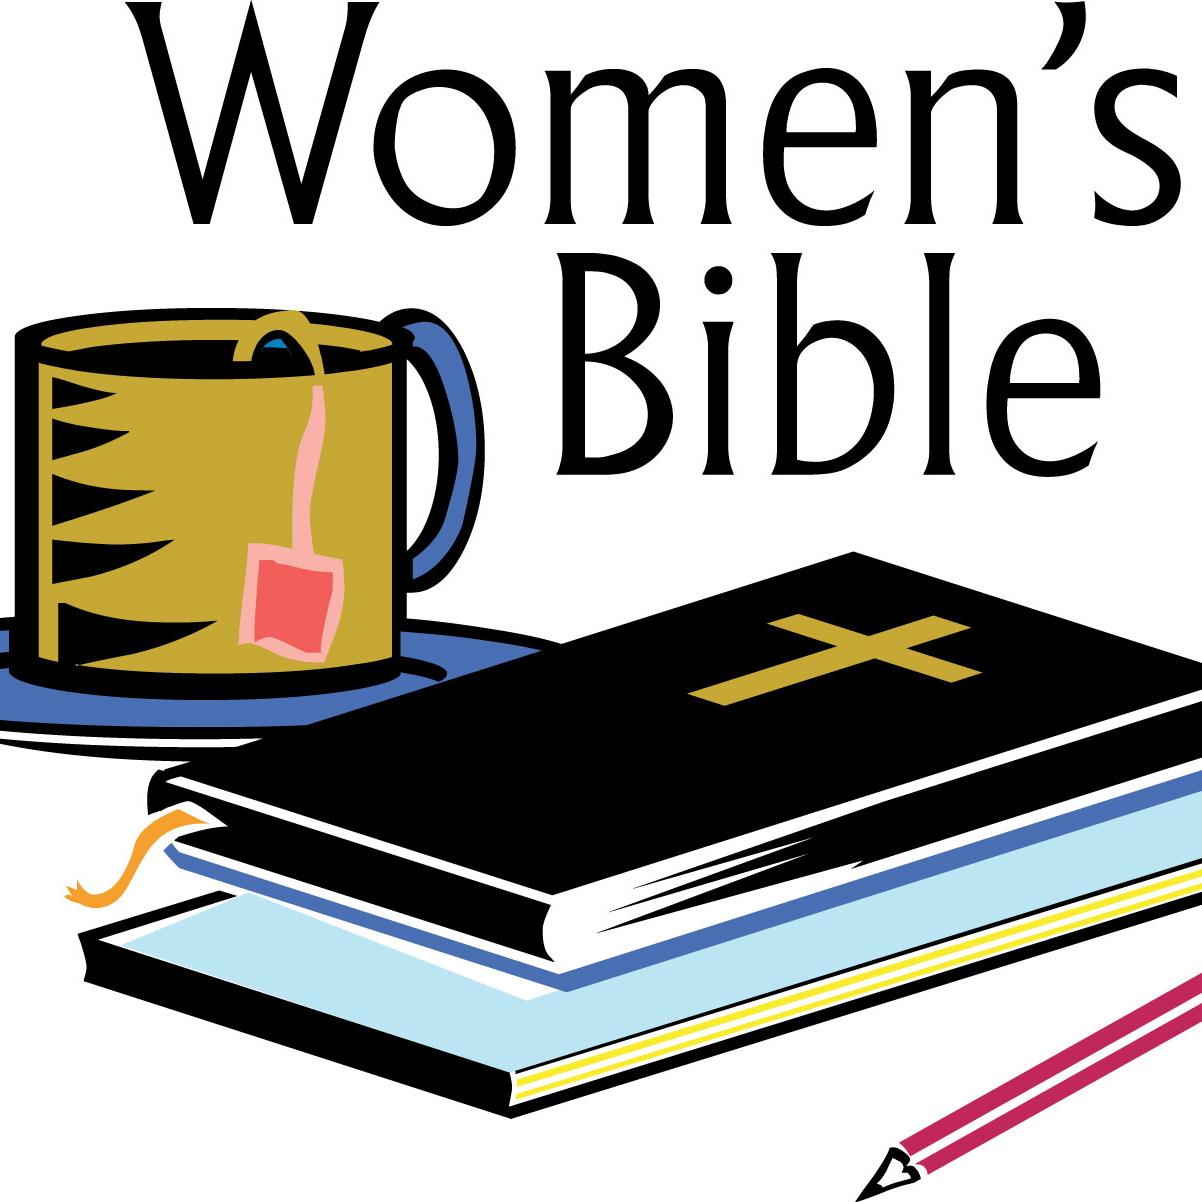 1202x1202 Top 73 Bible Clip Art